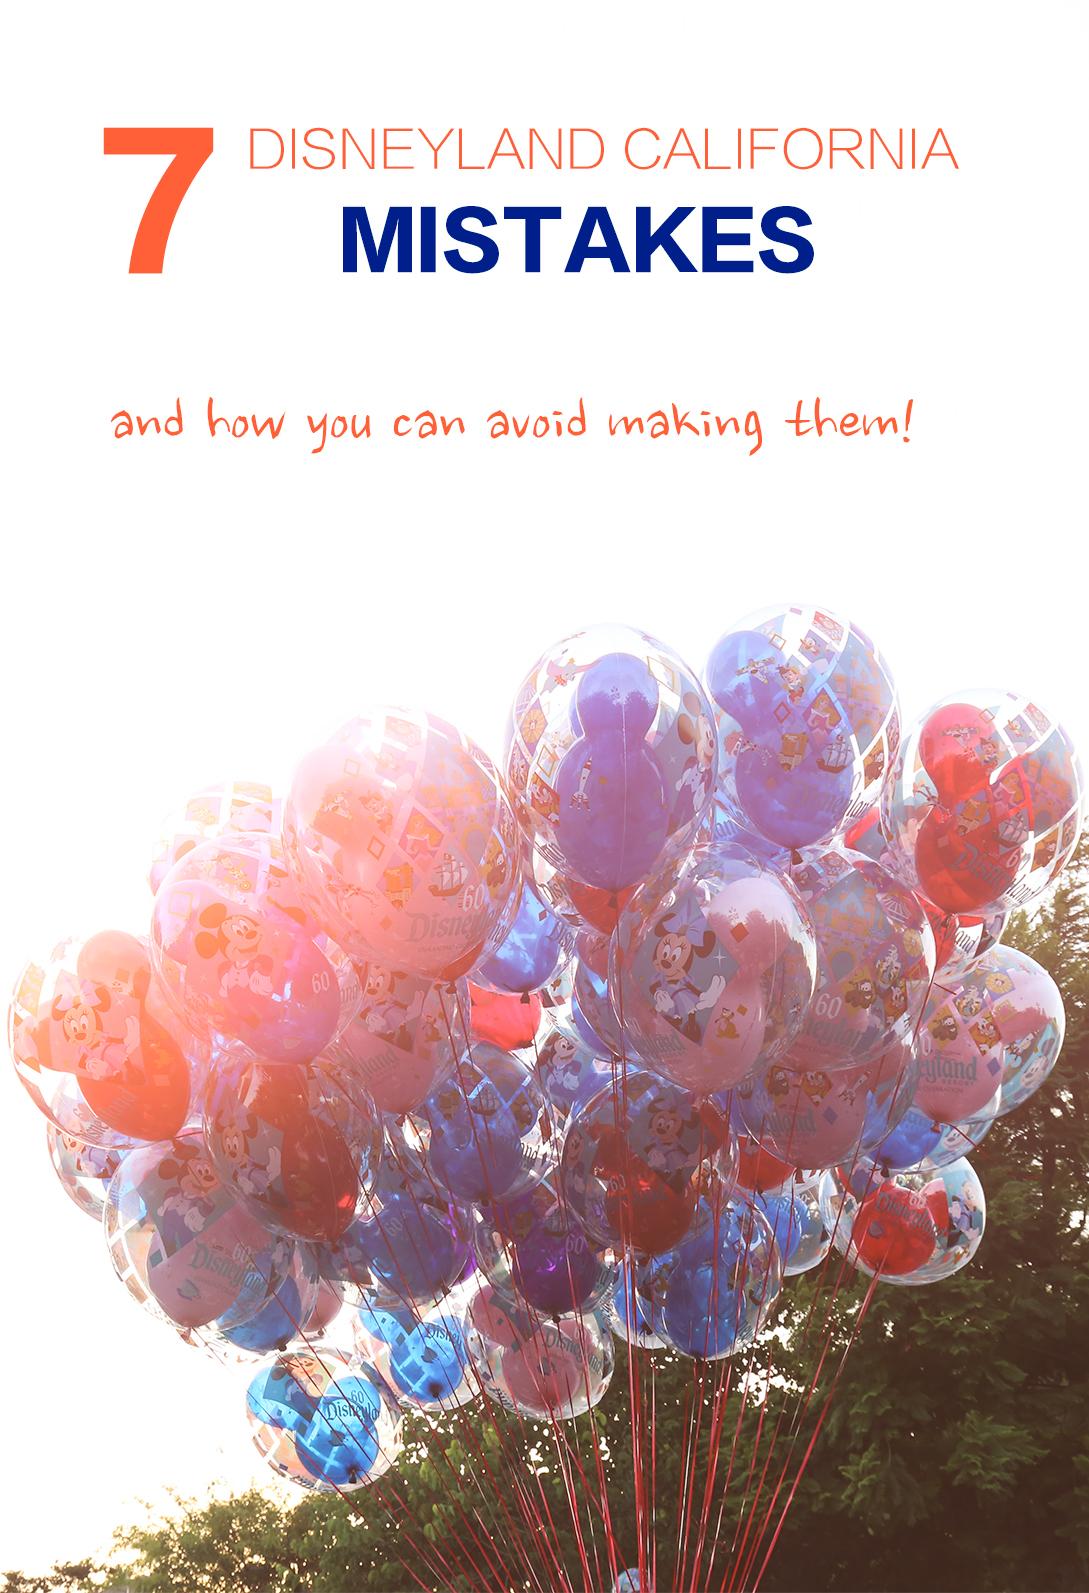 disneyland mistakes